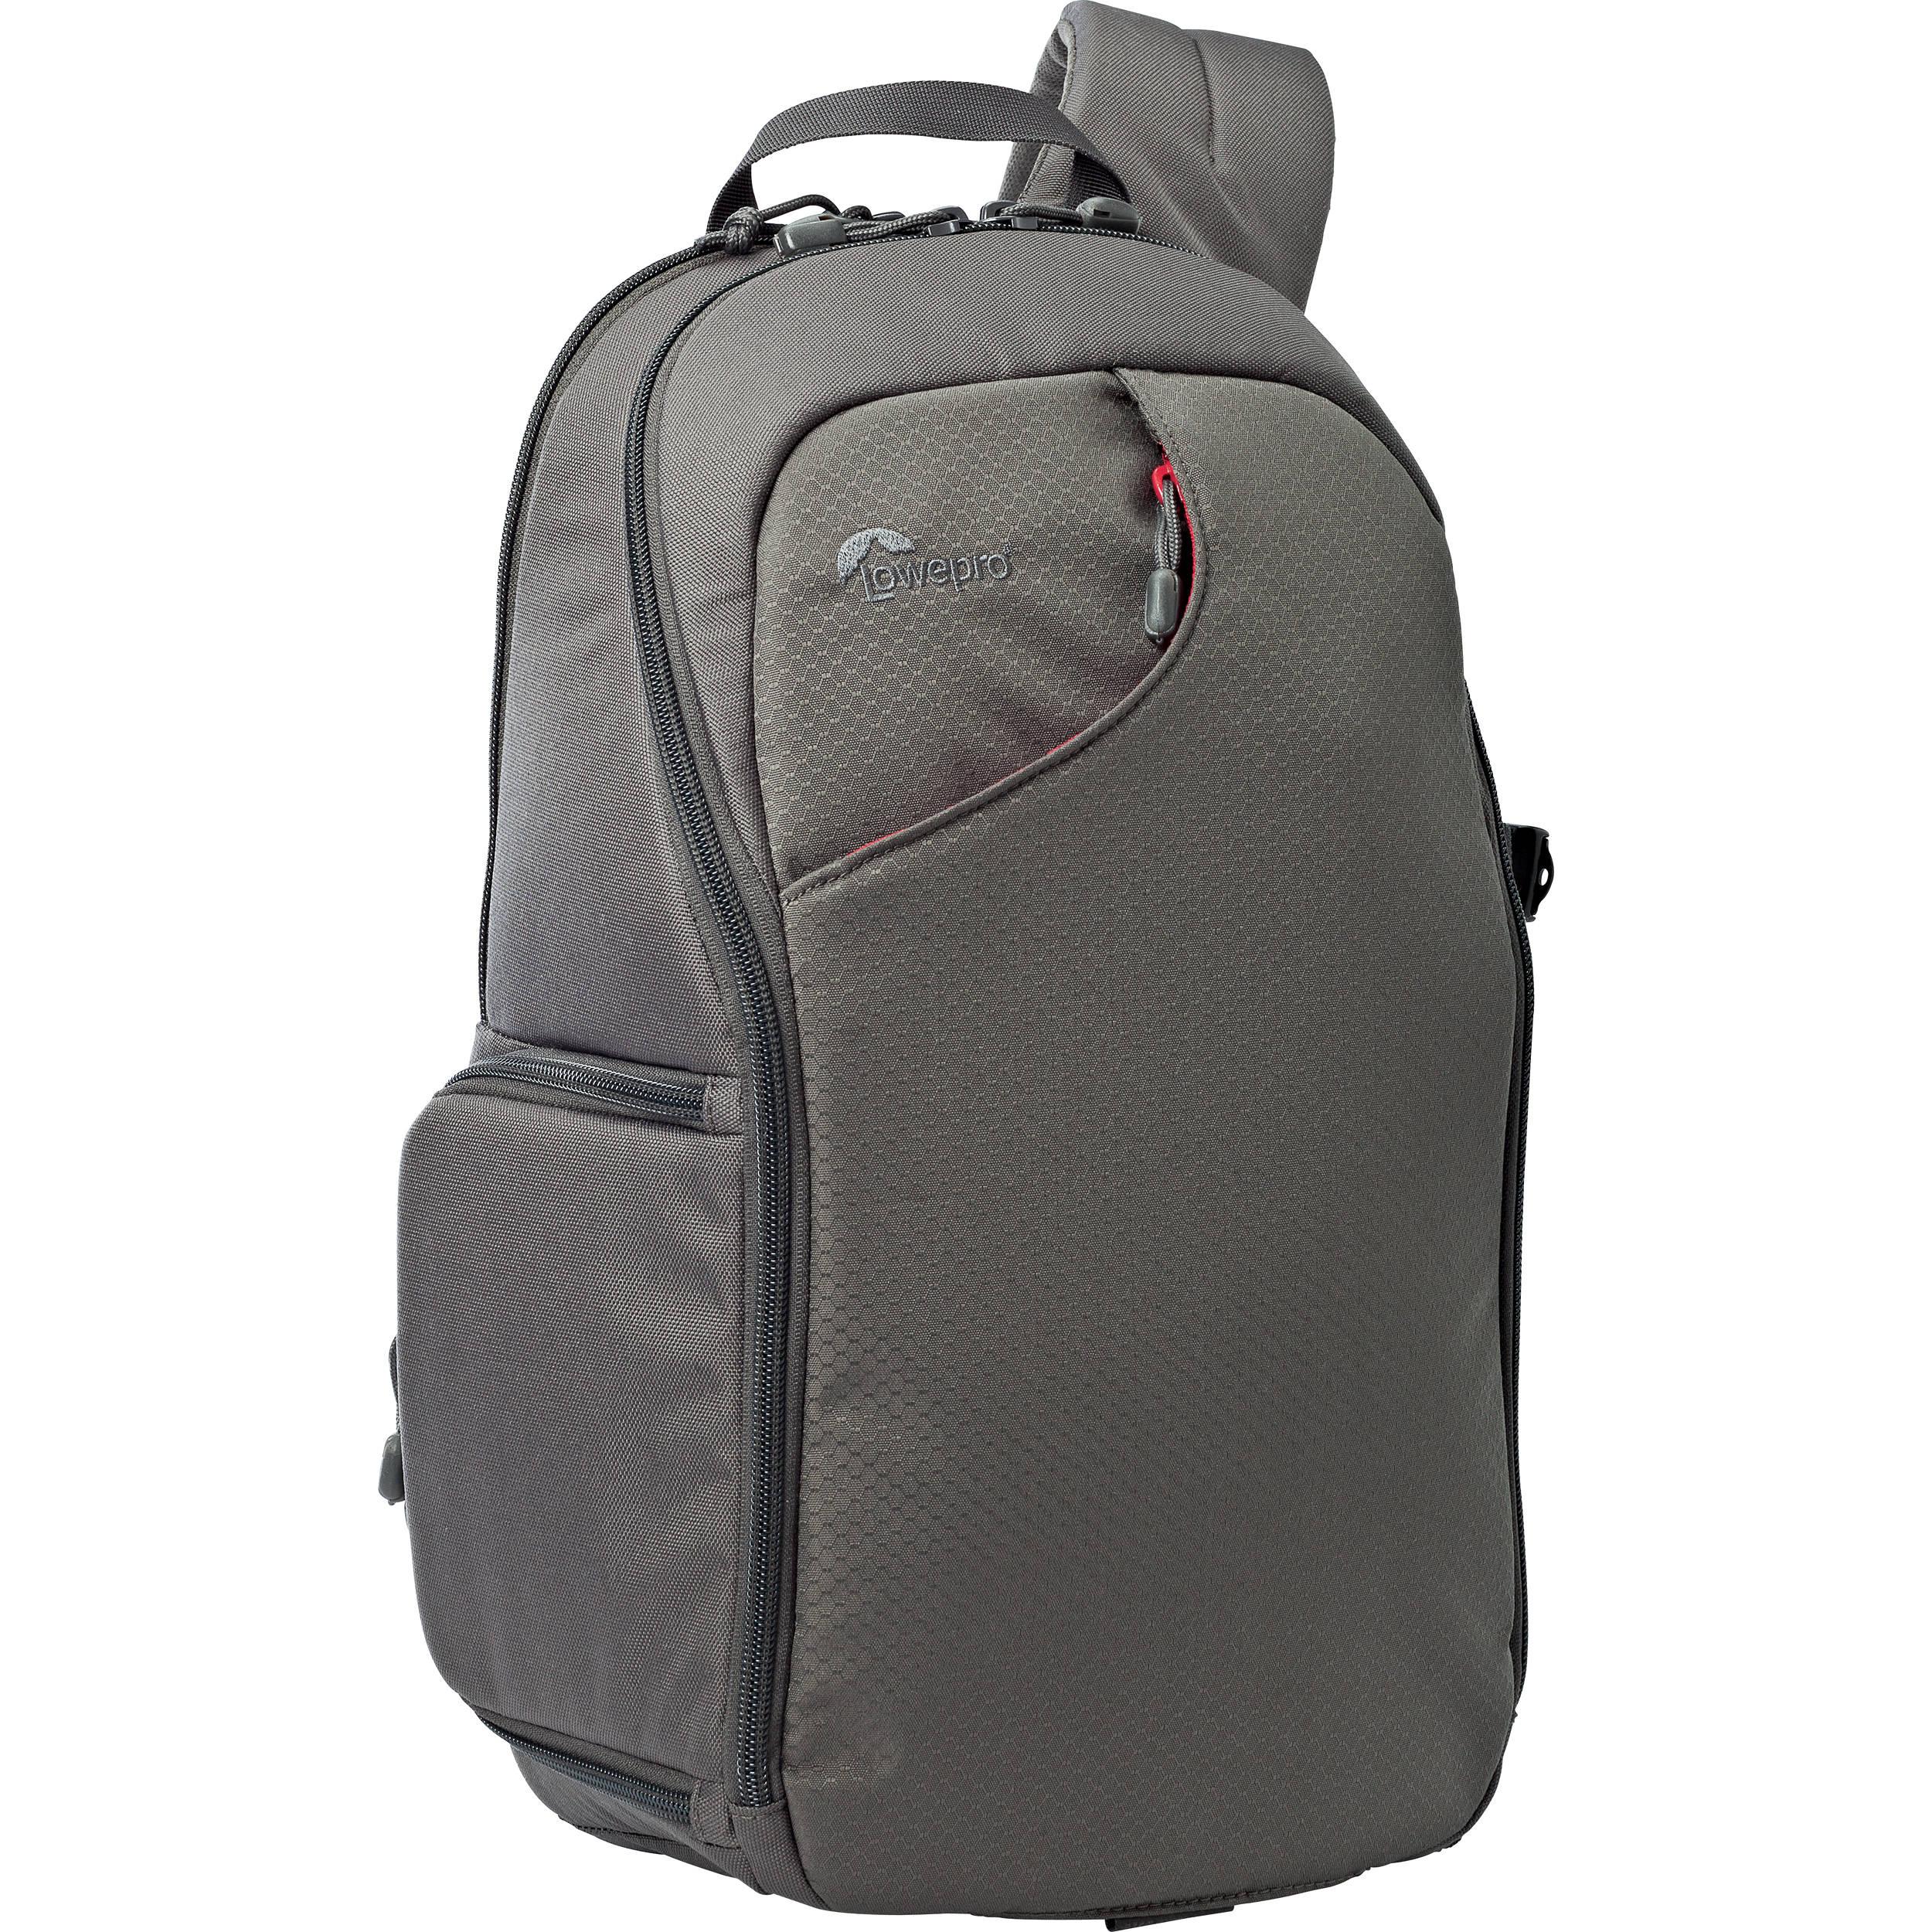 Lowepro Transit Sling Bag 250 AW LP36576-PWW Slate Grey